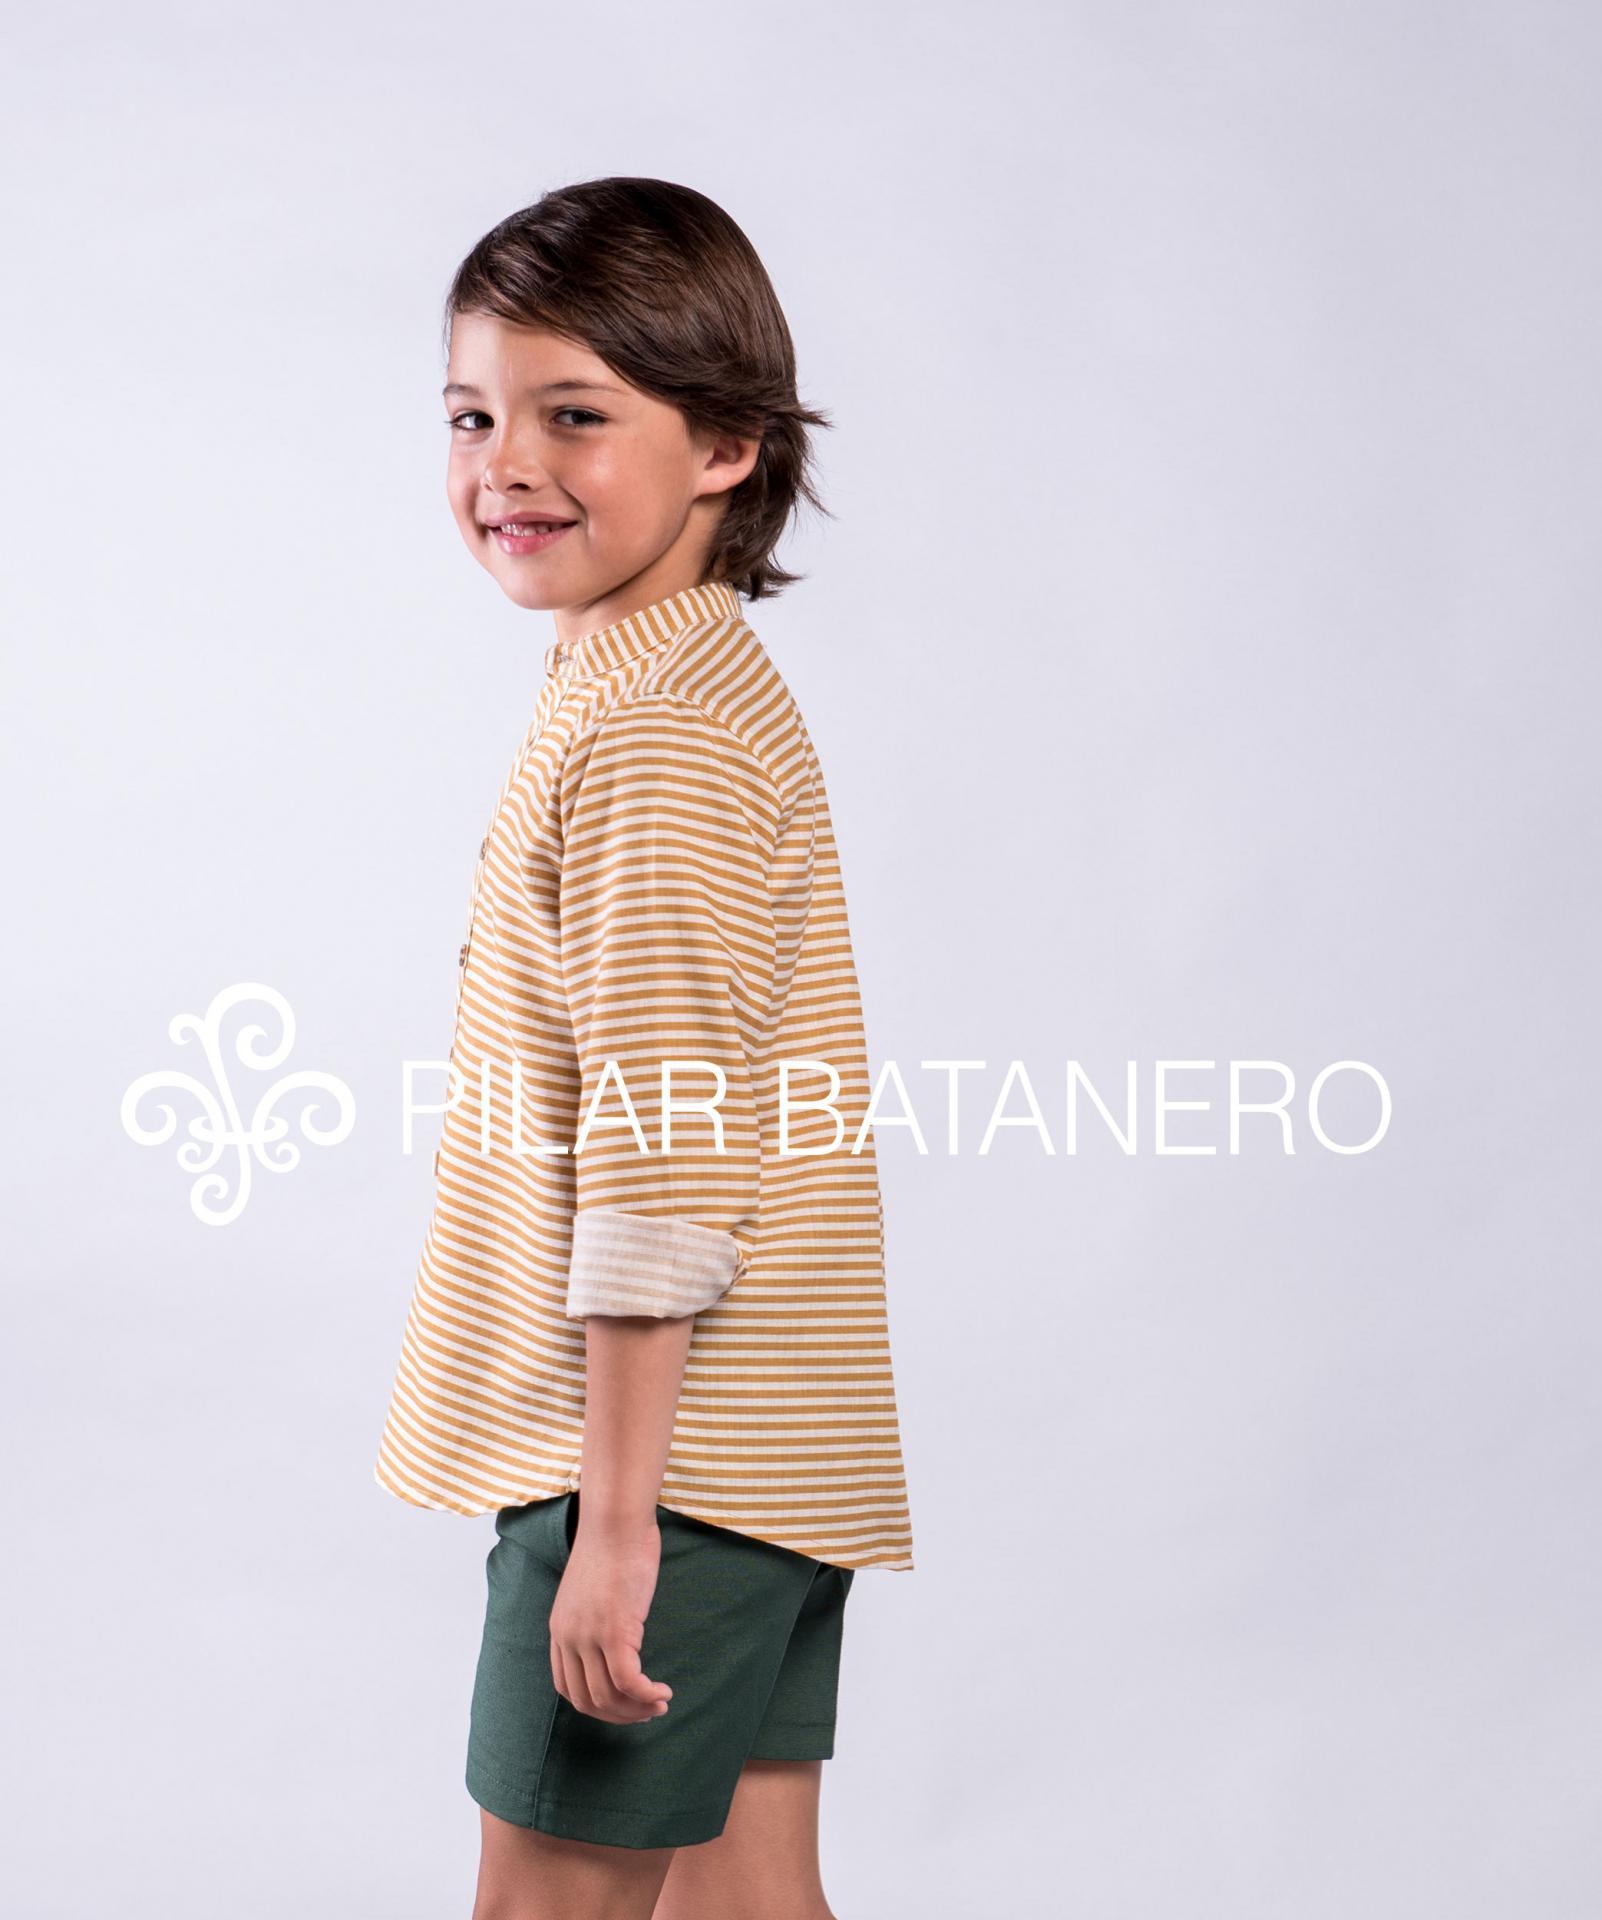 Camisa Pilar Batanero mod. Rayas horizontales color ocre.